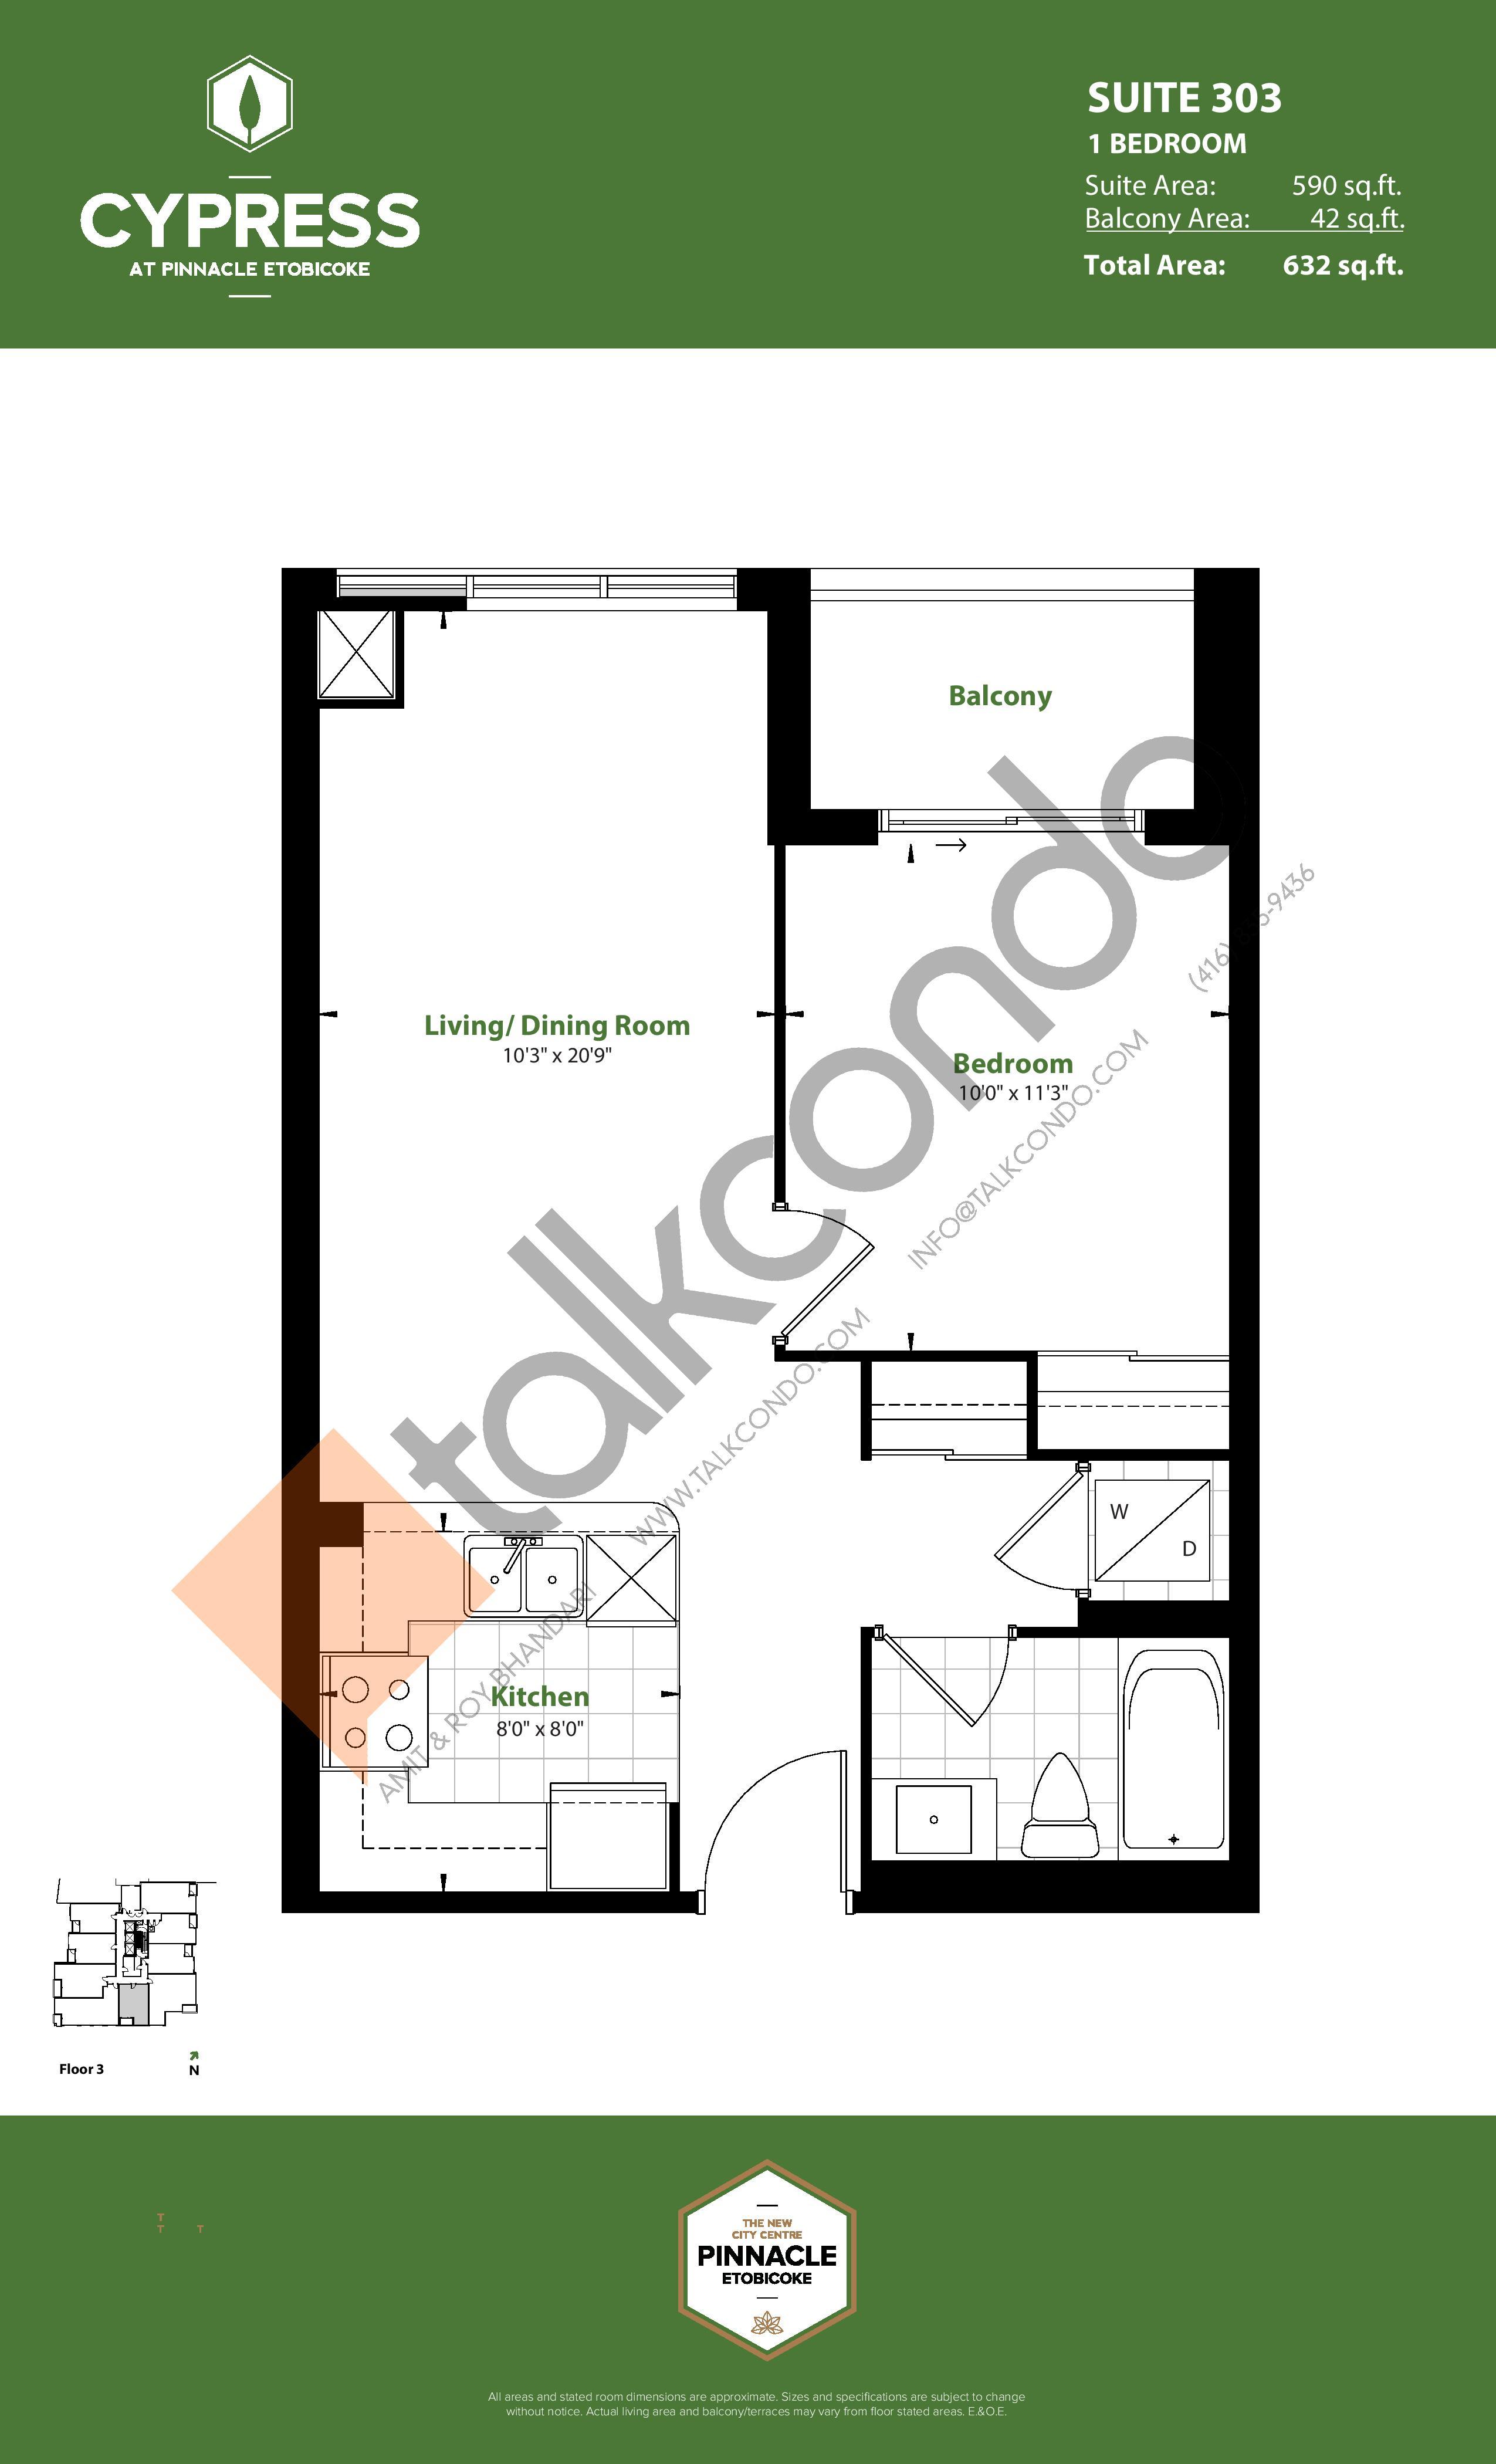 Suite 303 Floor Plan at Cypress at Pinnacle Etobicoke - 590 sq.ft